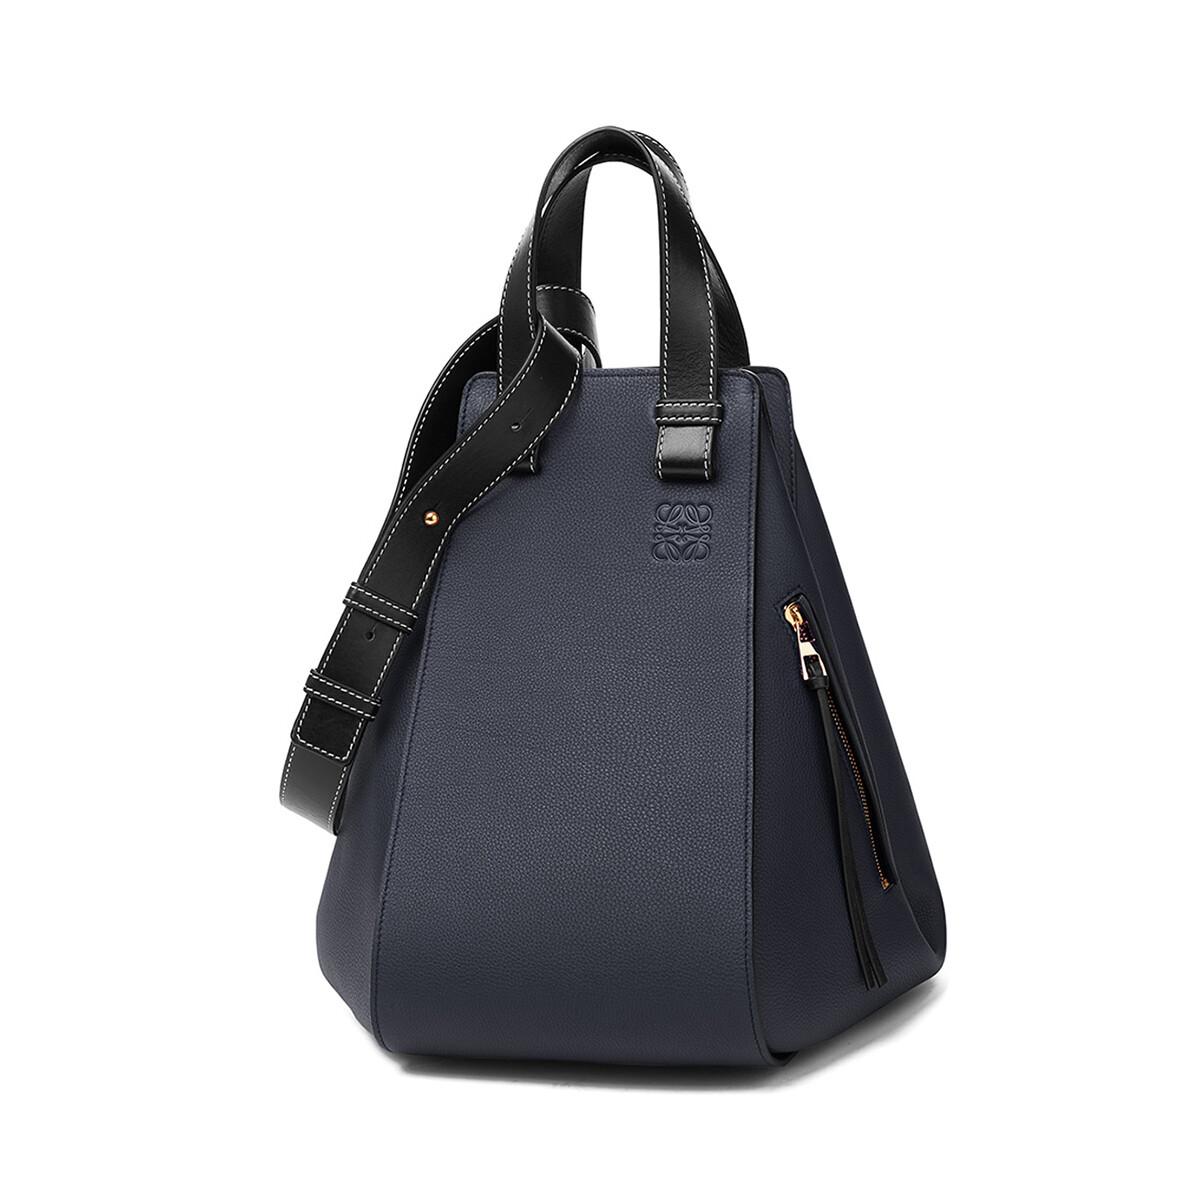 LOEWE Hammock Medium Bag Midnight Blue/Black front